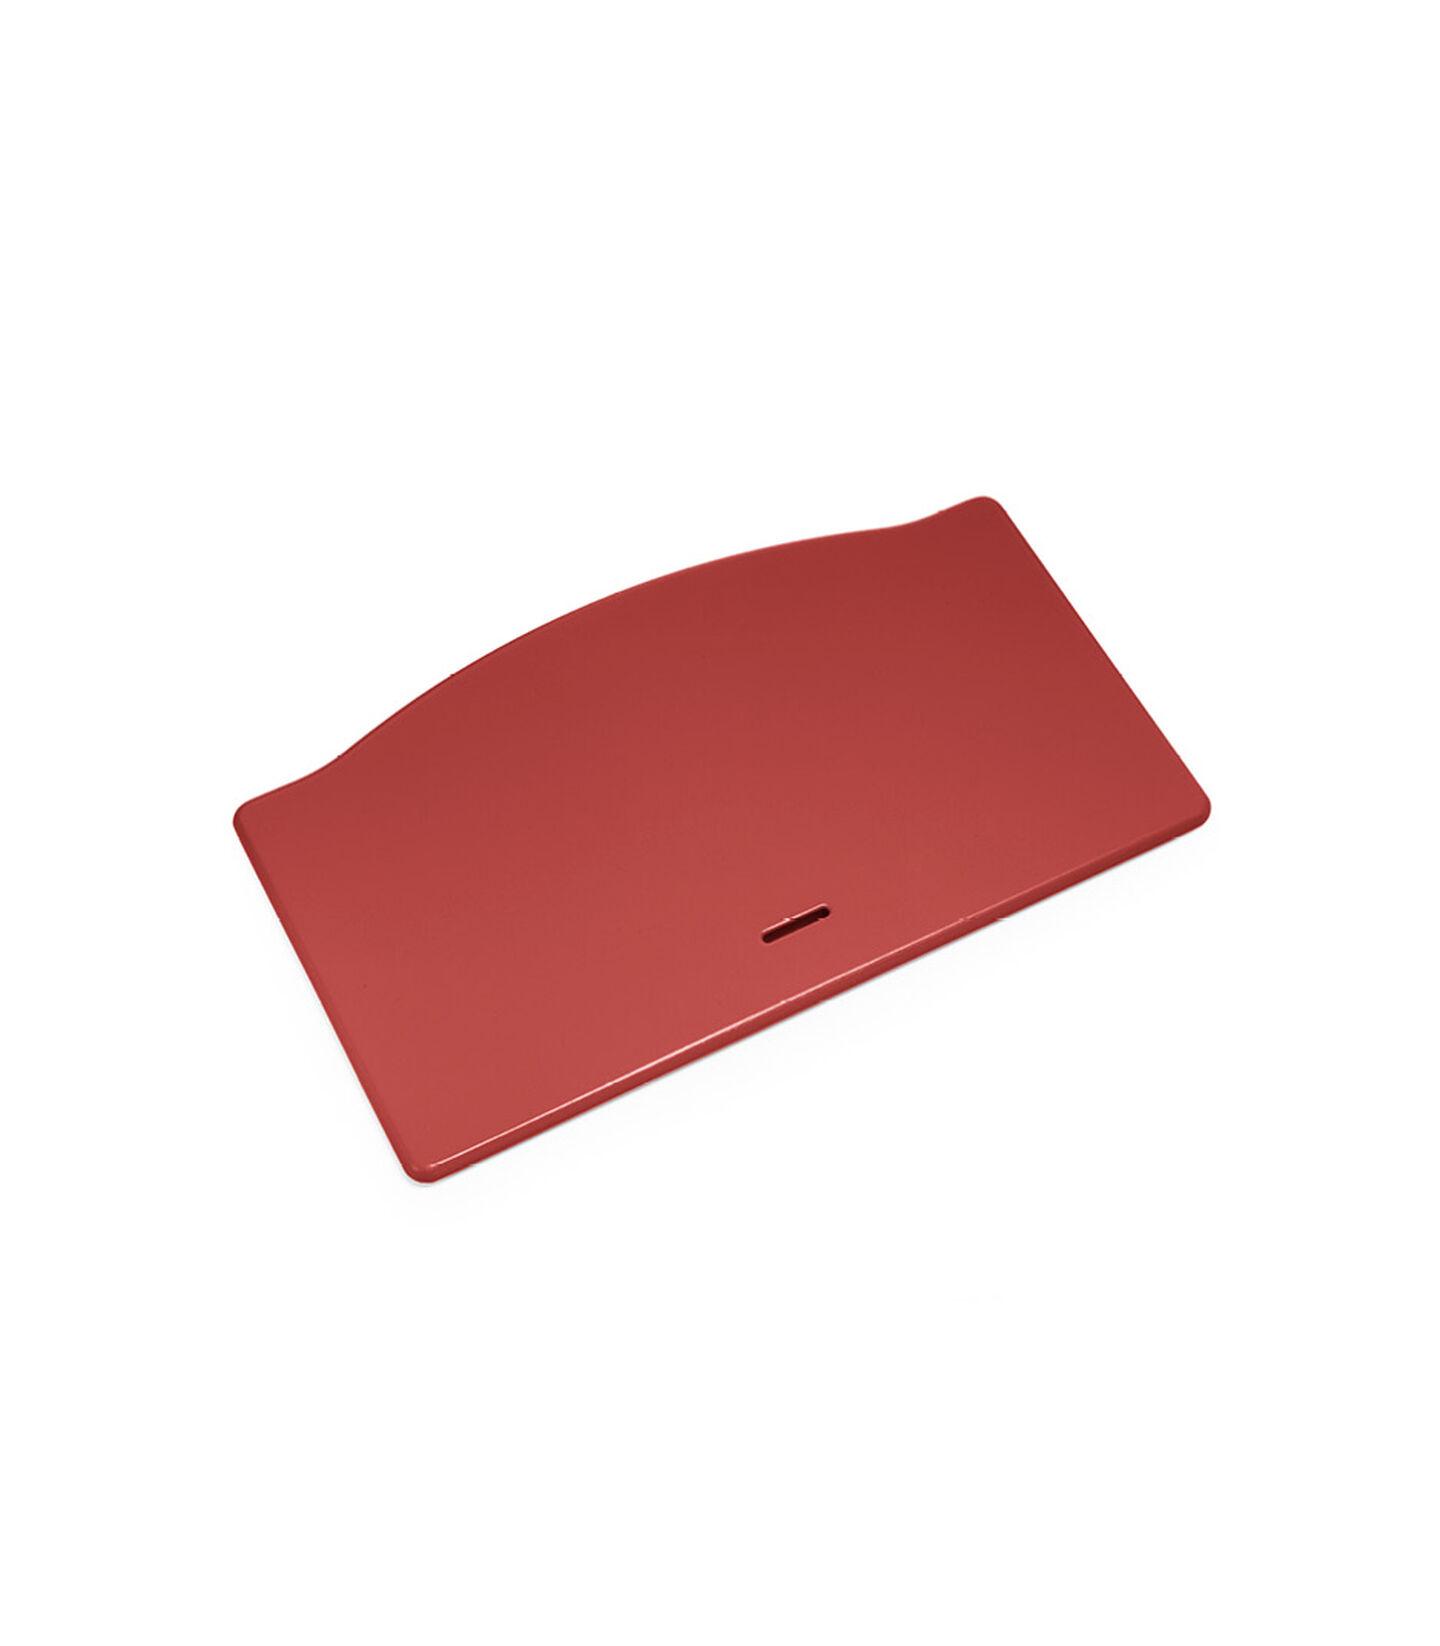 Tripp Trapp® SeggiolinoPlate Warm Red, Warm Red, mainview